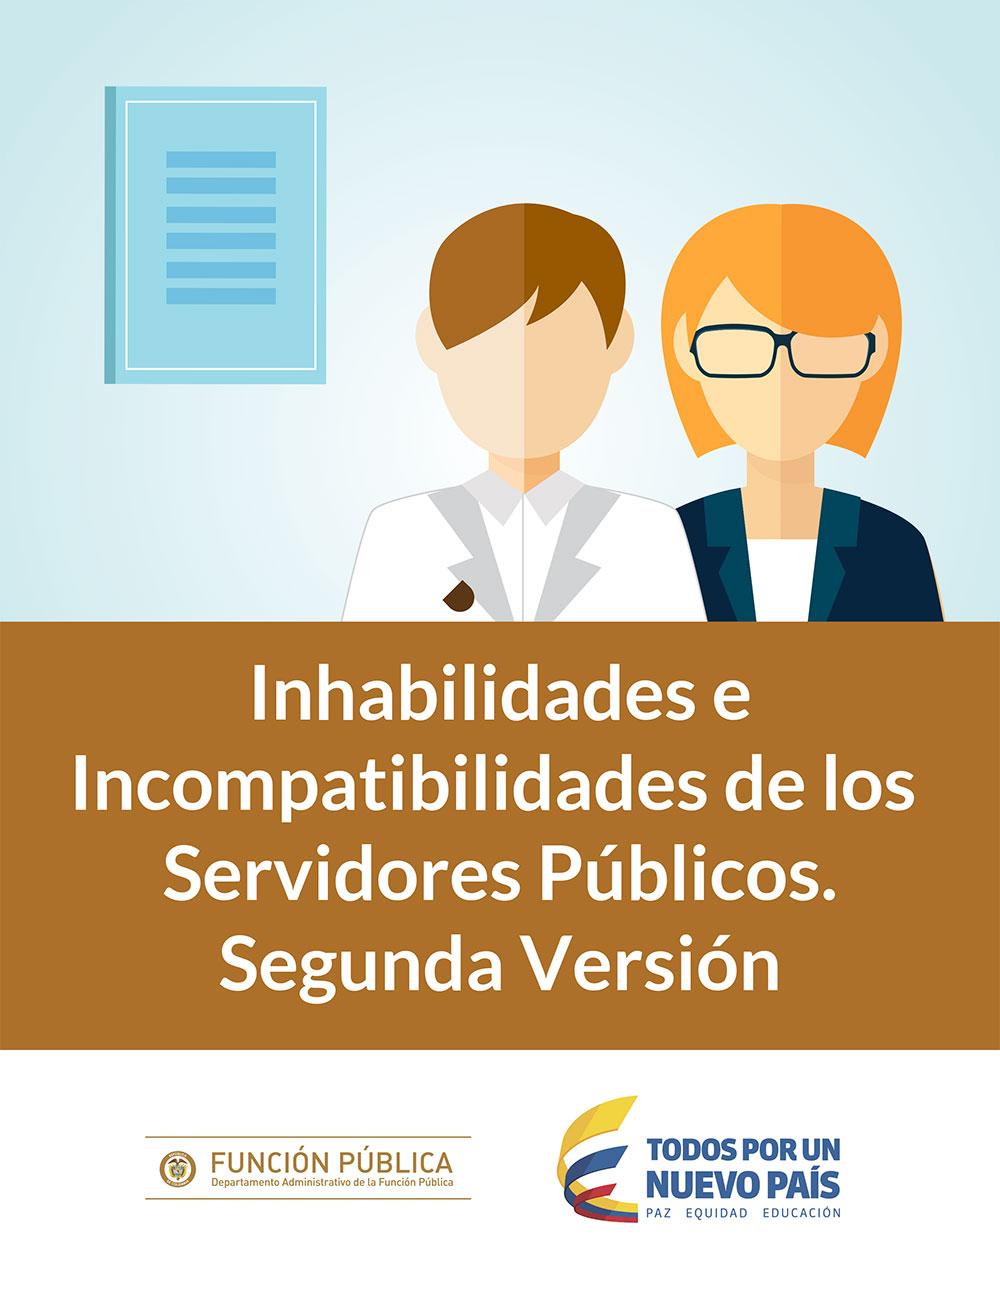 Inhabilidades e Incompatibilidades de los Servidores Públicos